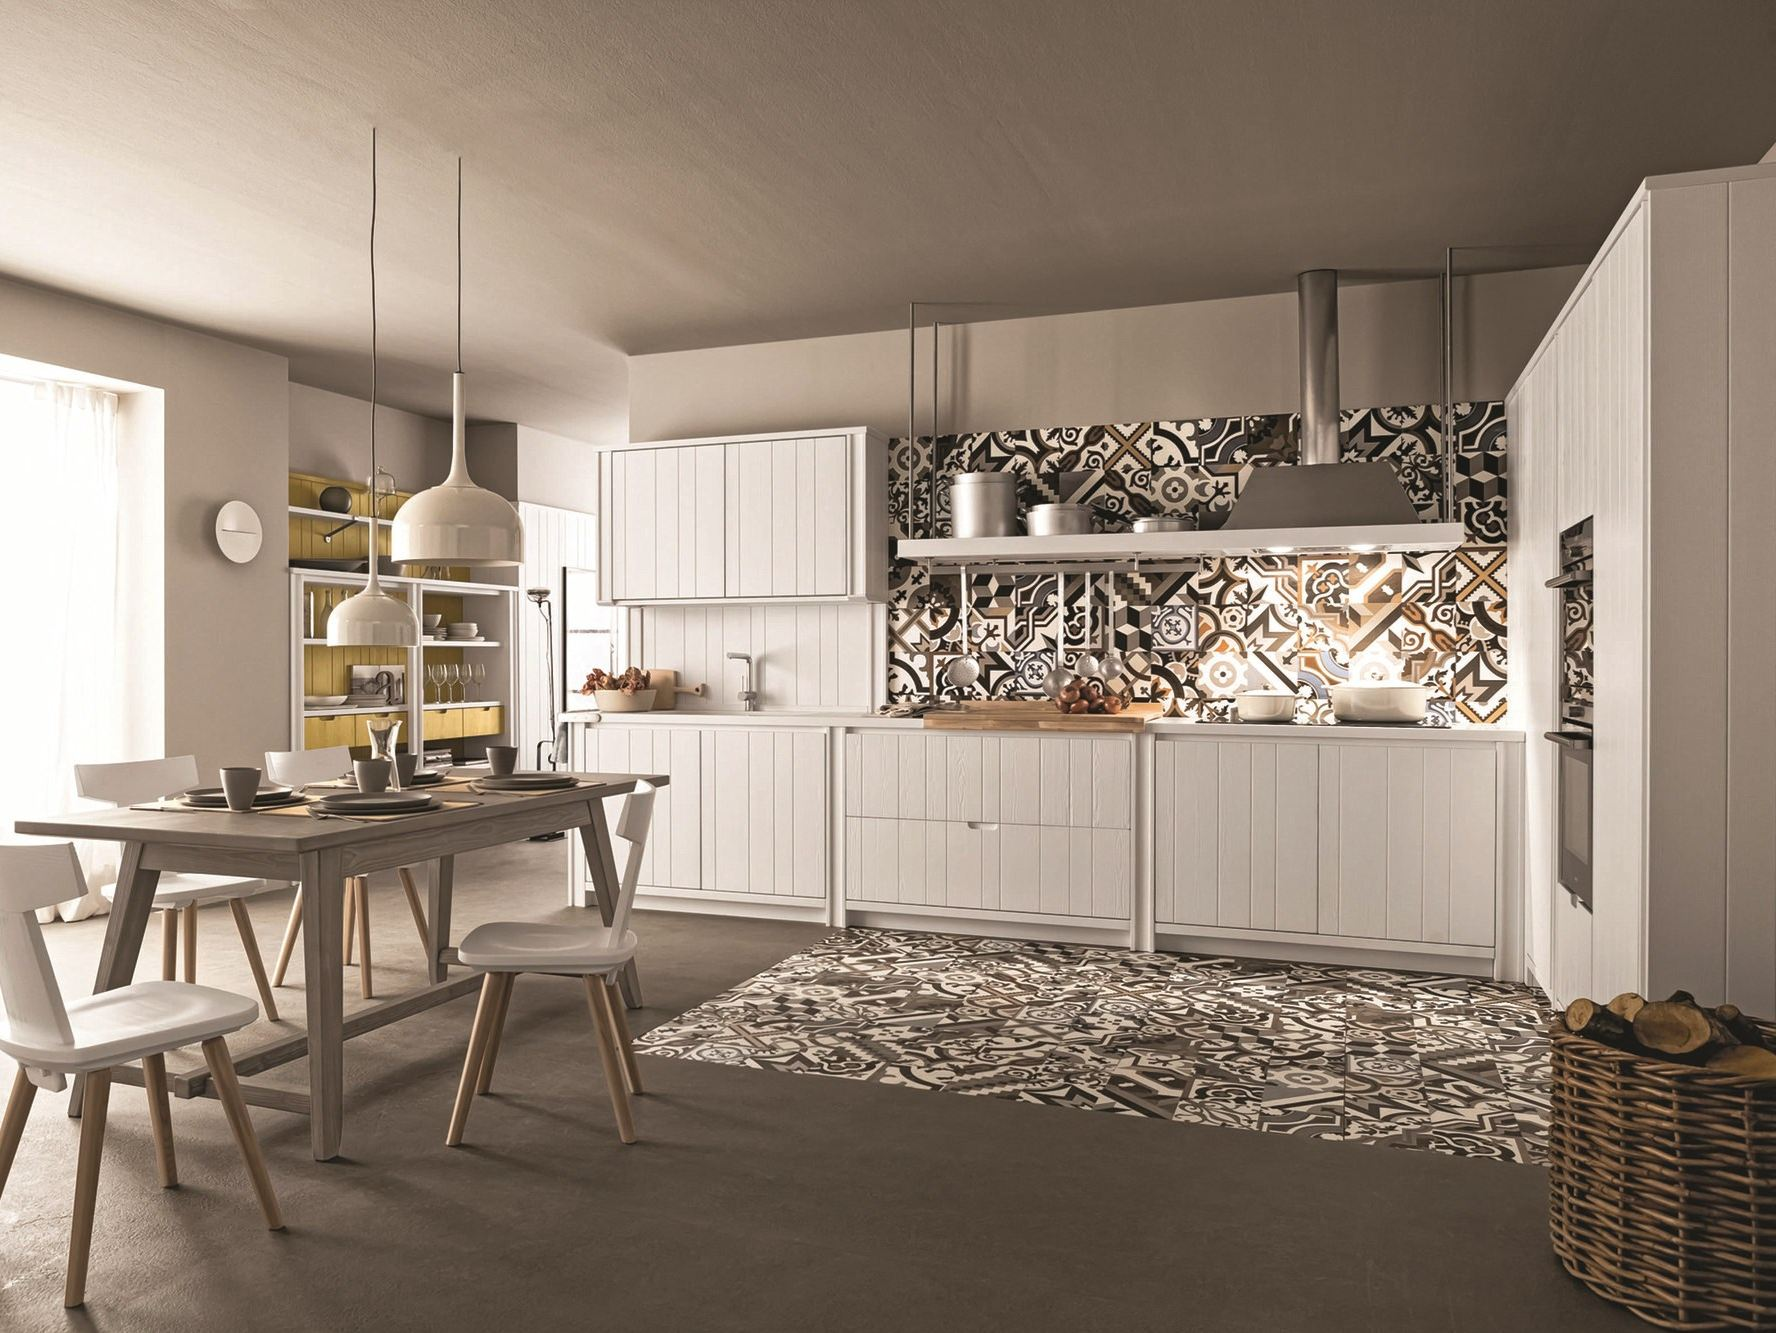 Cucina lineare in abete gesso MAESTRALE 04 by Scandola Mobili